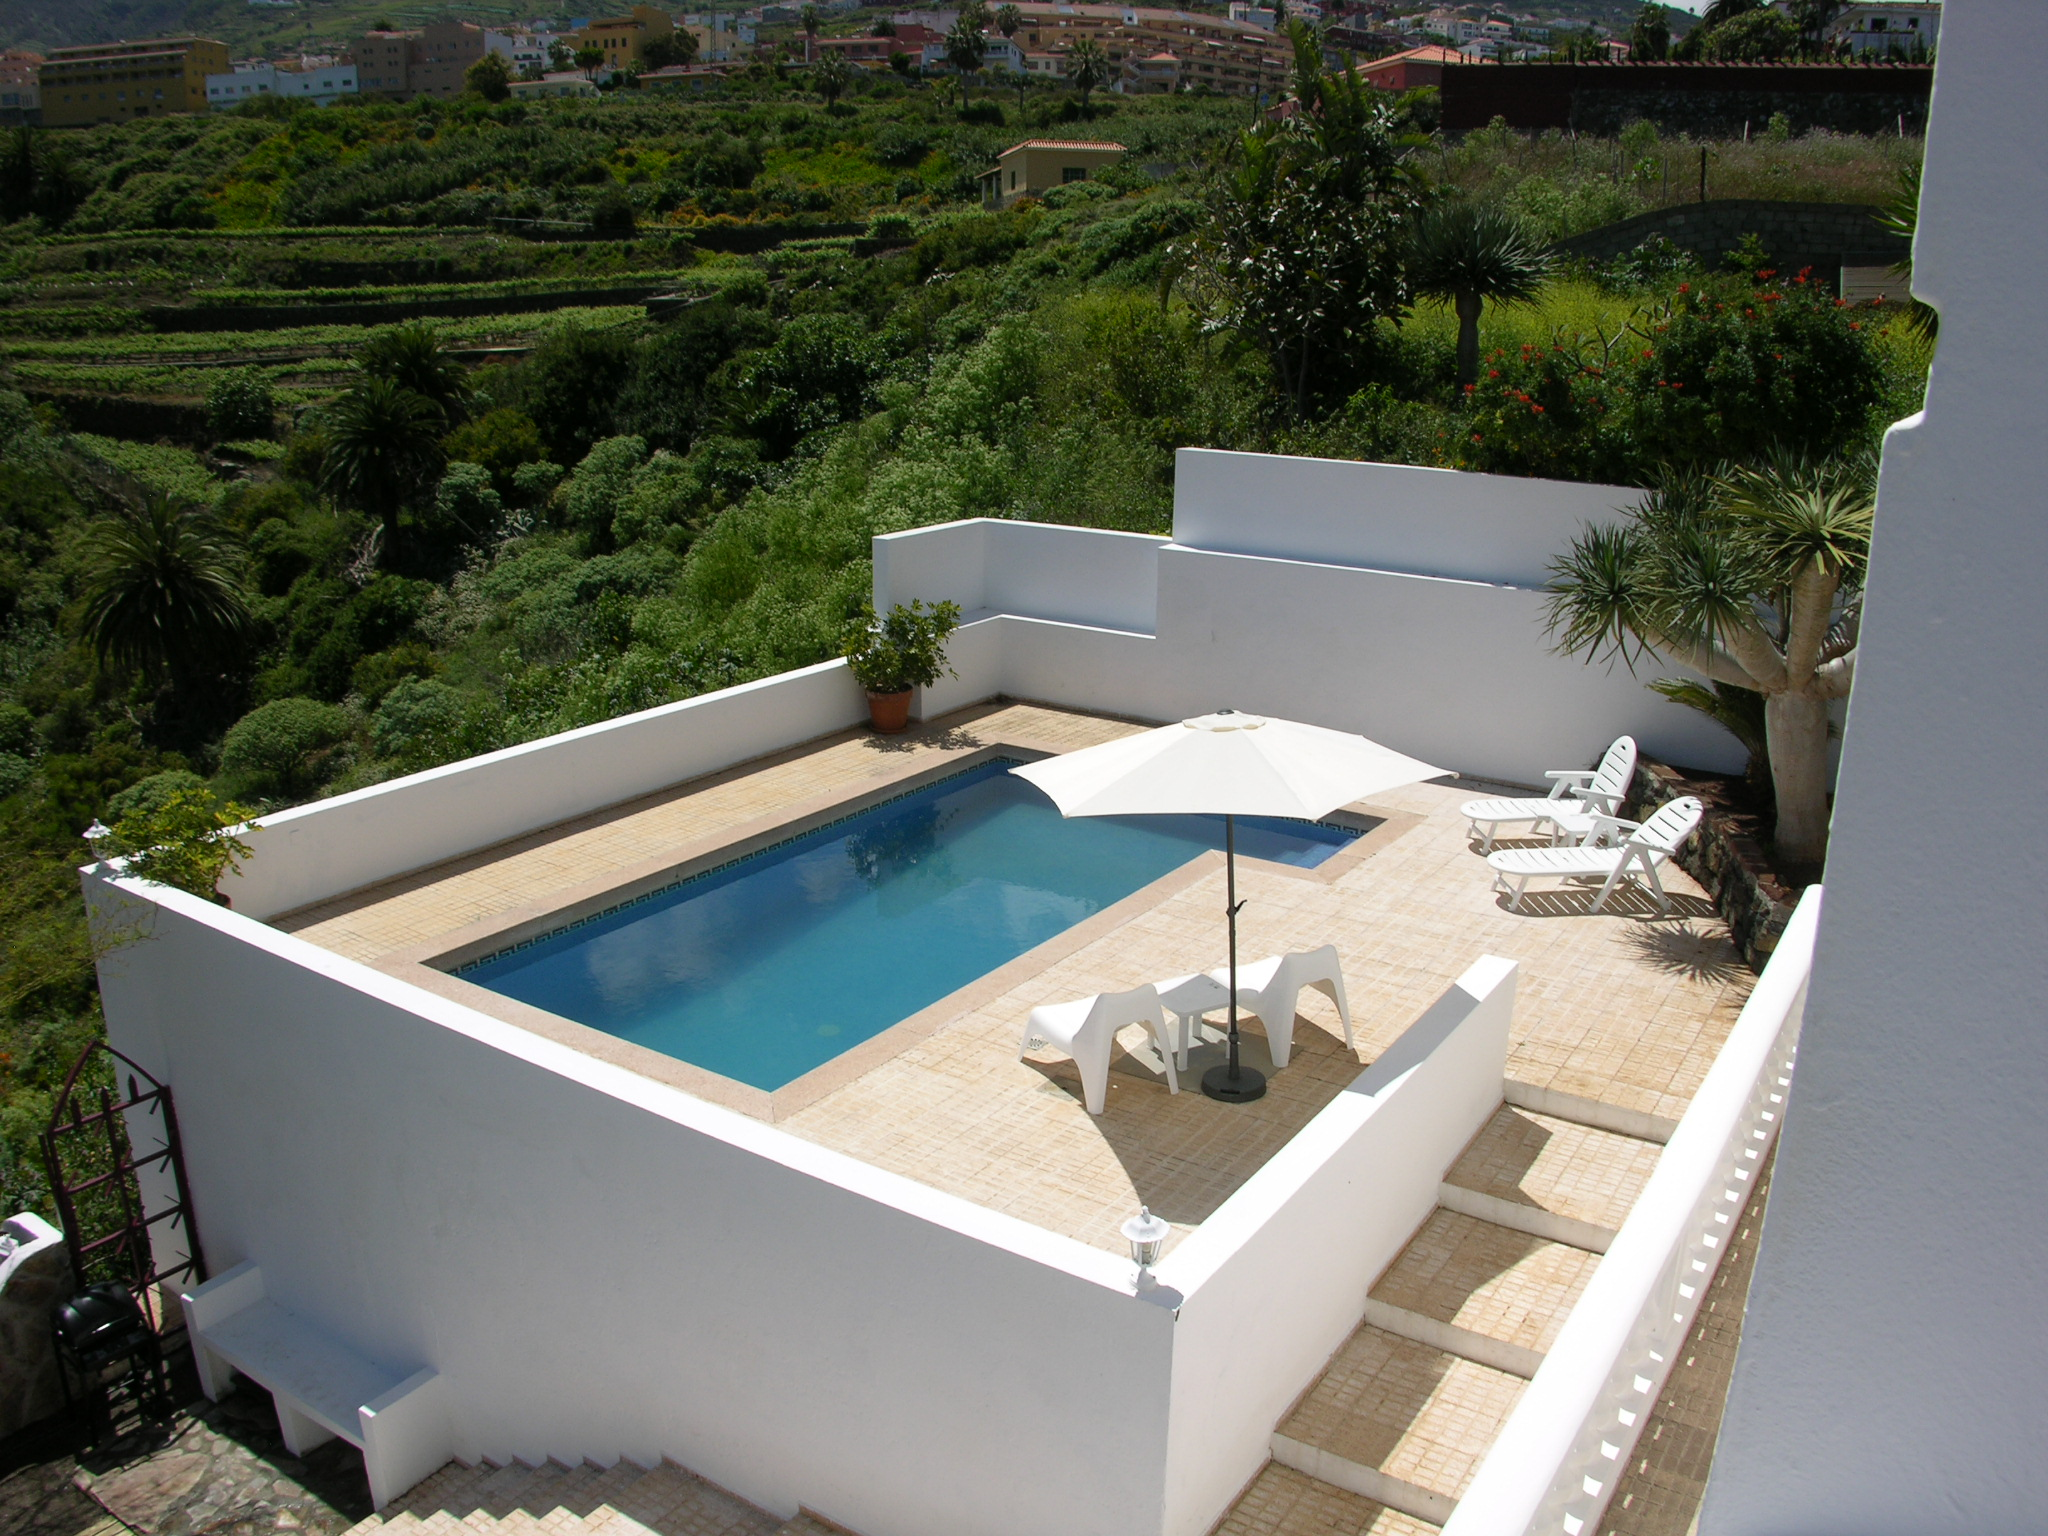 Maison de vacances Villa Vista La Quinta beheizbarer Pool kostenloses WLAN Grill (2124407), Santa Ursula, Ténérife, Iles Canaries, Espagne, image 53